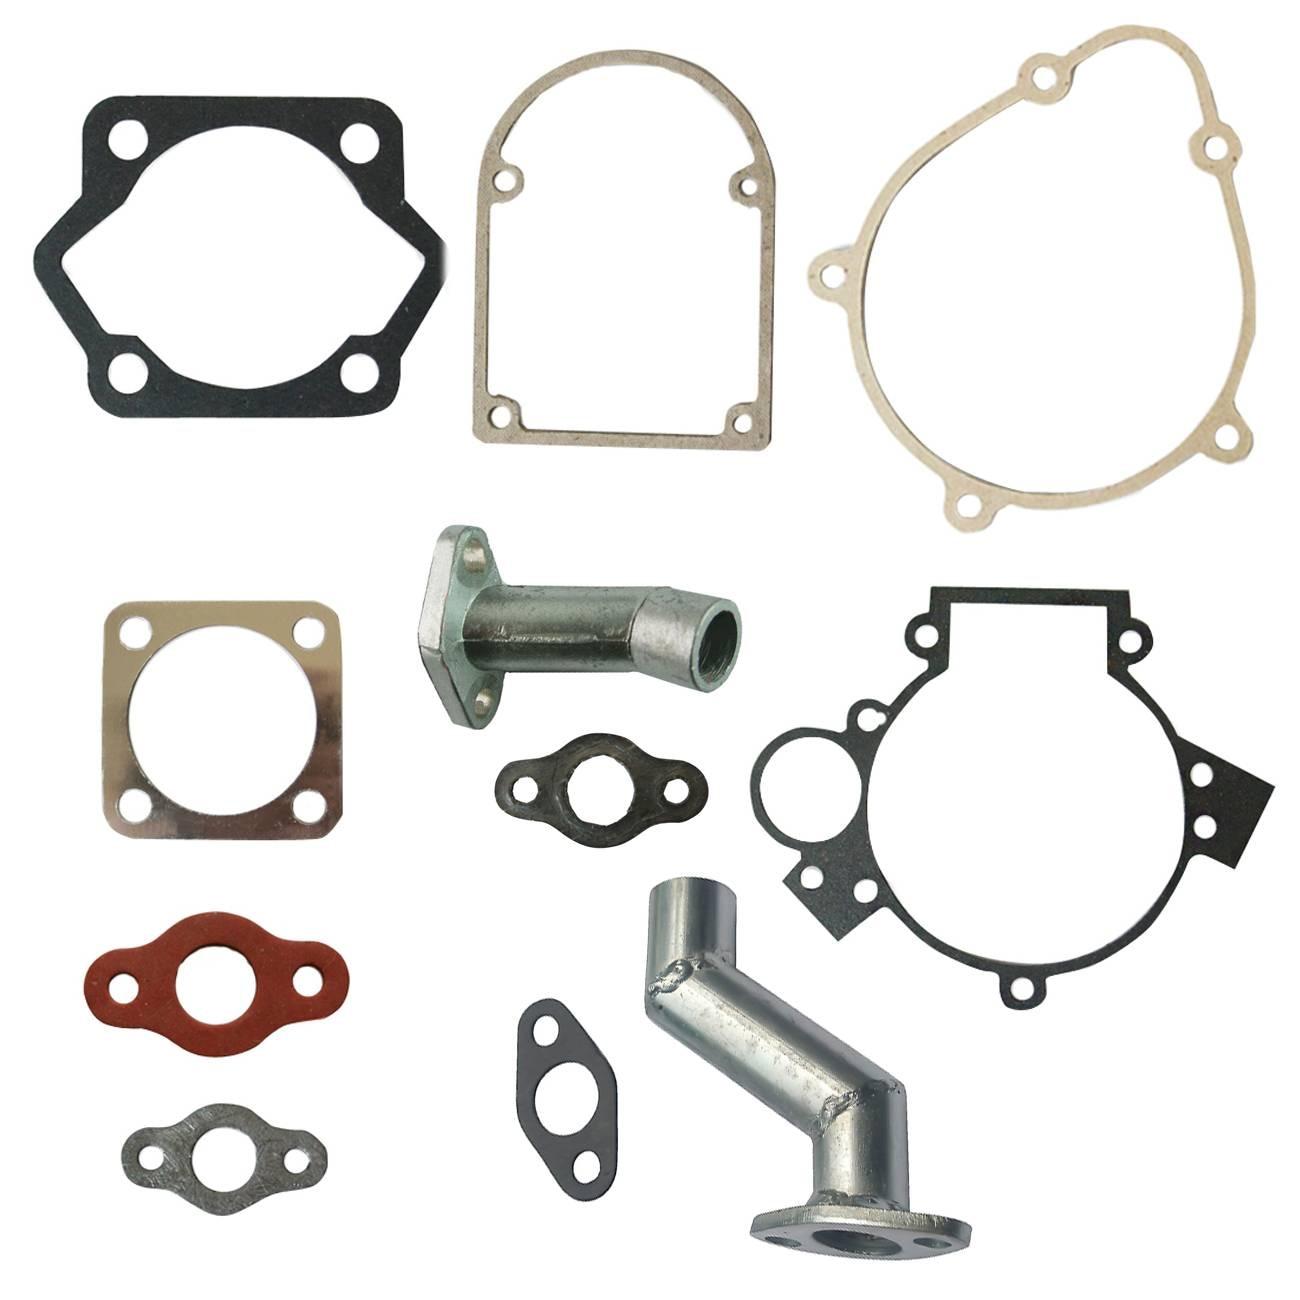 Gasket Kit&Intake Manifold Carburetor For 49cc 66cc 80cc 2 Stroke Motorized Bike solgar бета глюканы 1 3 60 таблеток специальные добавки